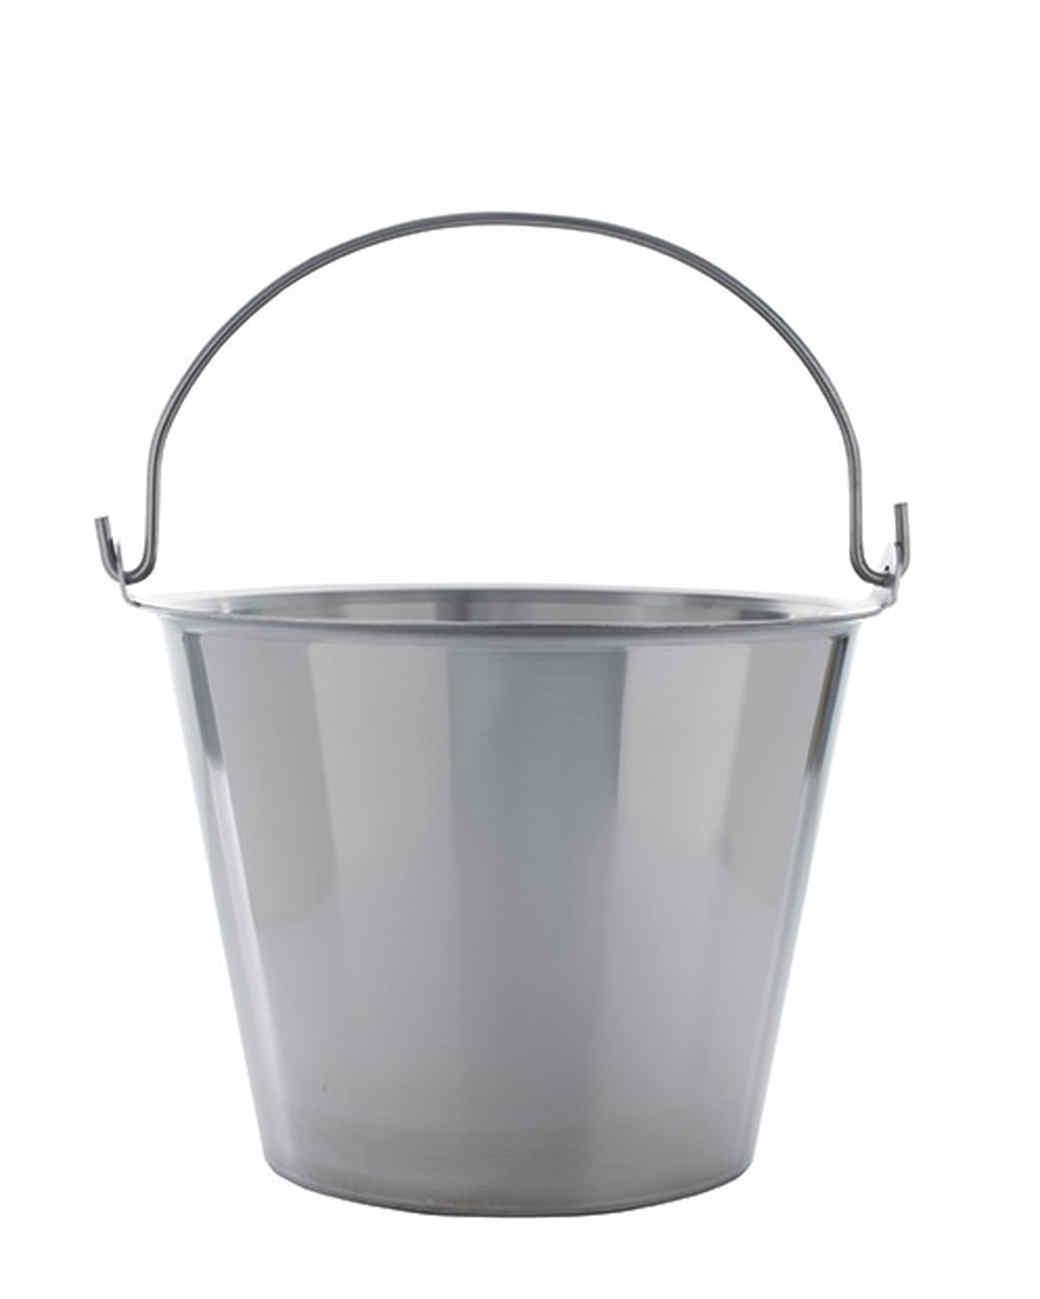 mld106069_0910_bucket.jpg